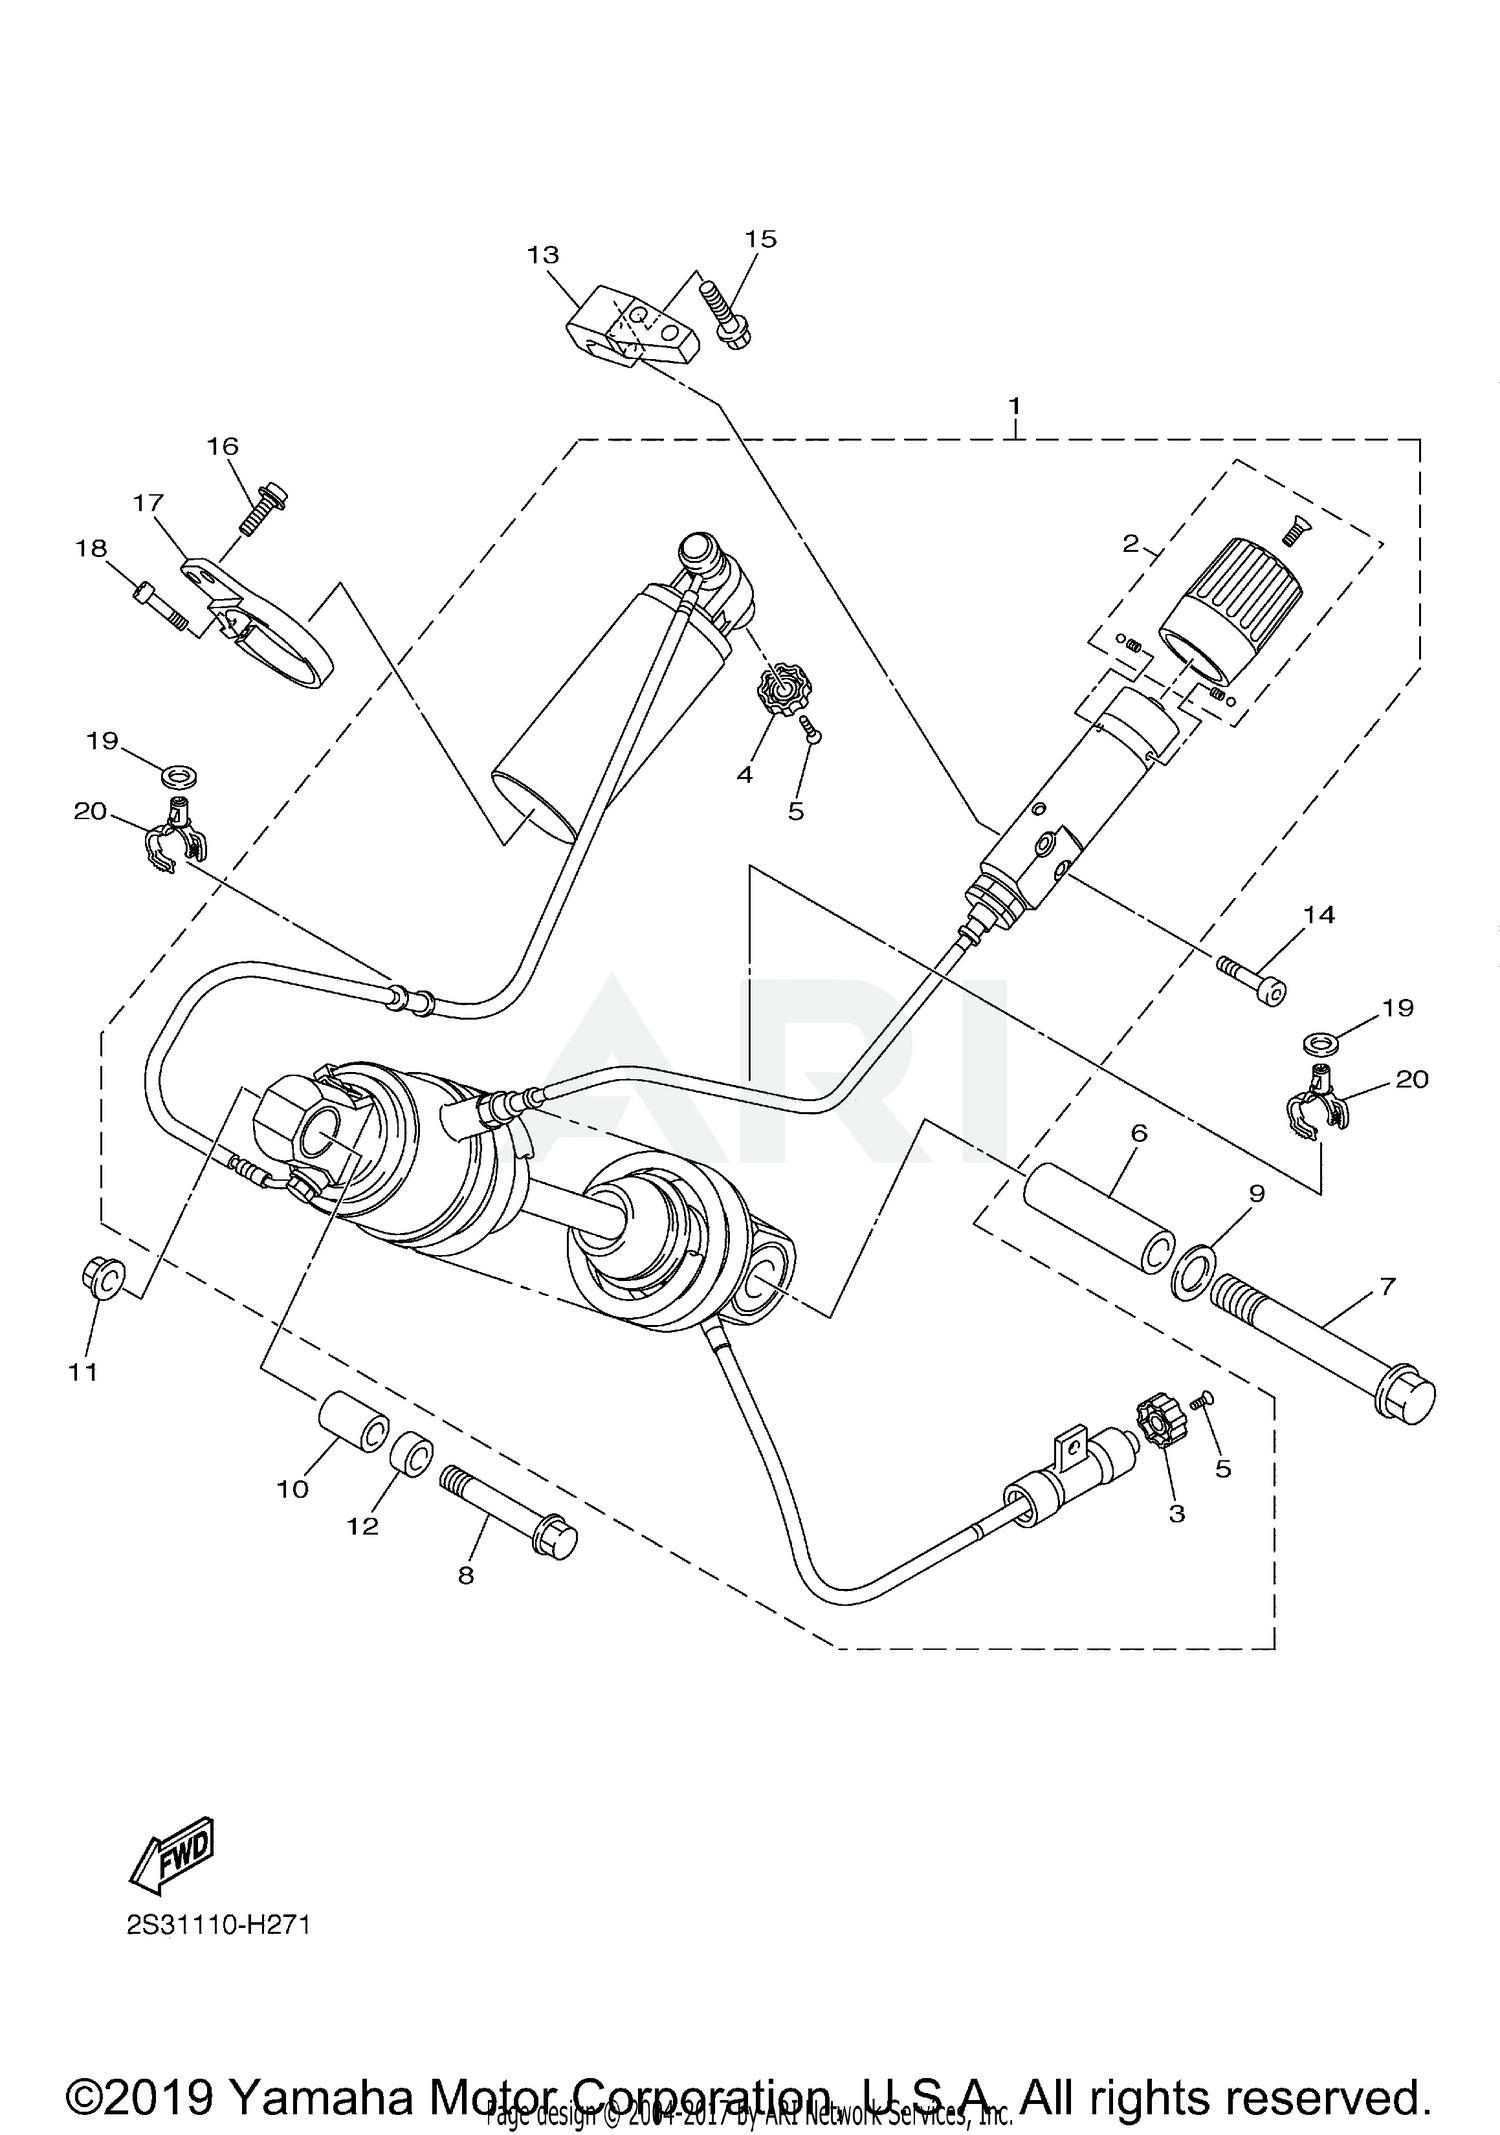 Harley Davidson Motorcycle Parts Diagram 2018 Yamaha V Max Vmx17jcgy Rear Suspension Parts Best Of Harley Davidson Motorcycle Parts Diagram